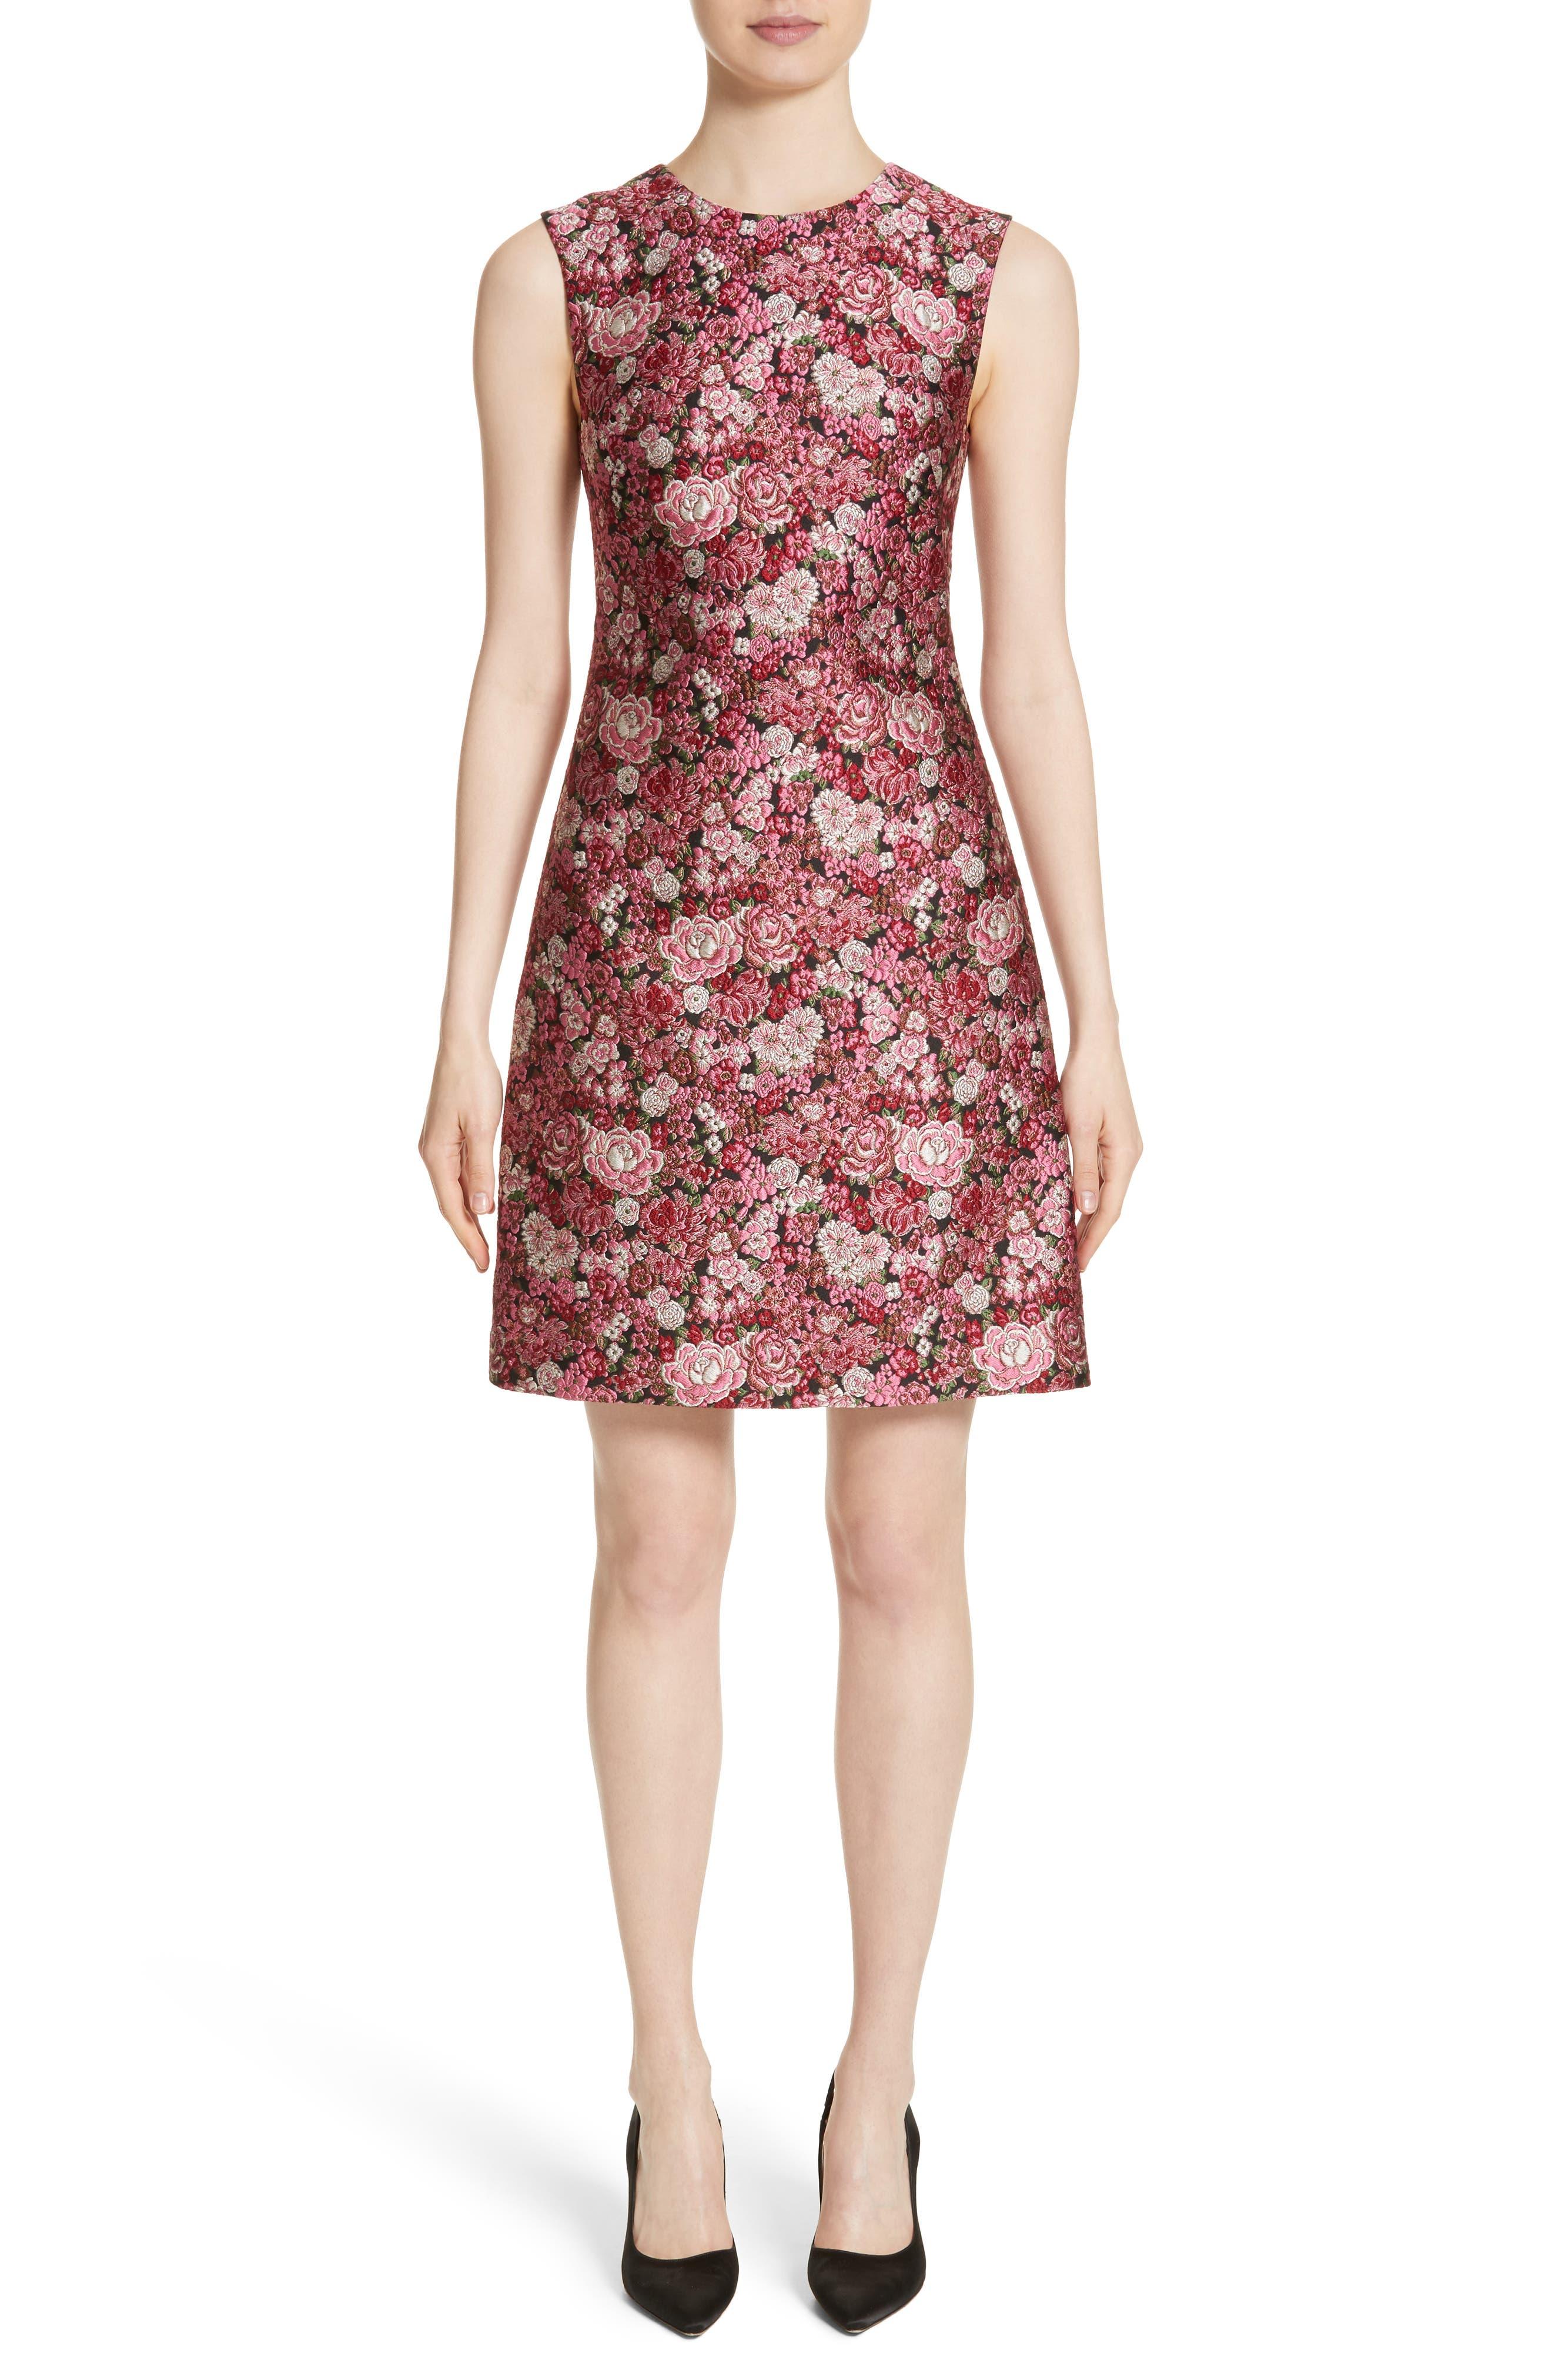 Main Image - Adam Lippes Floral Brocade Dress